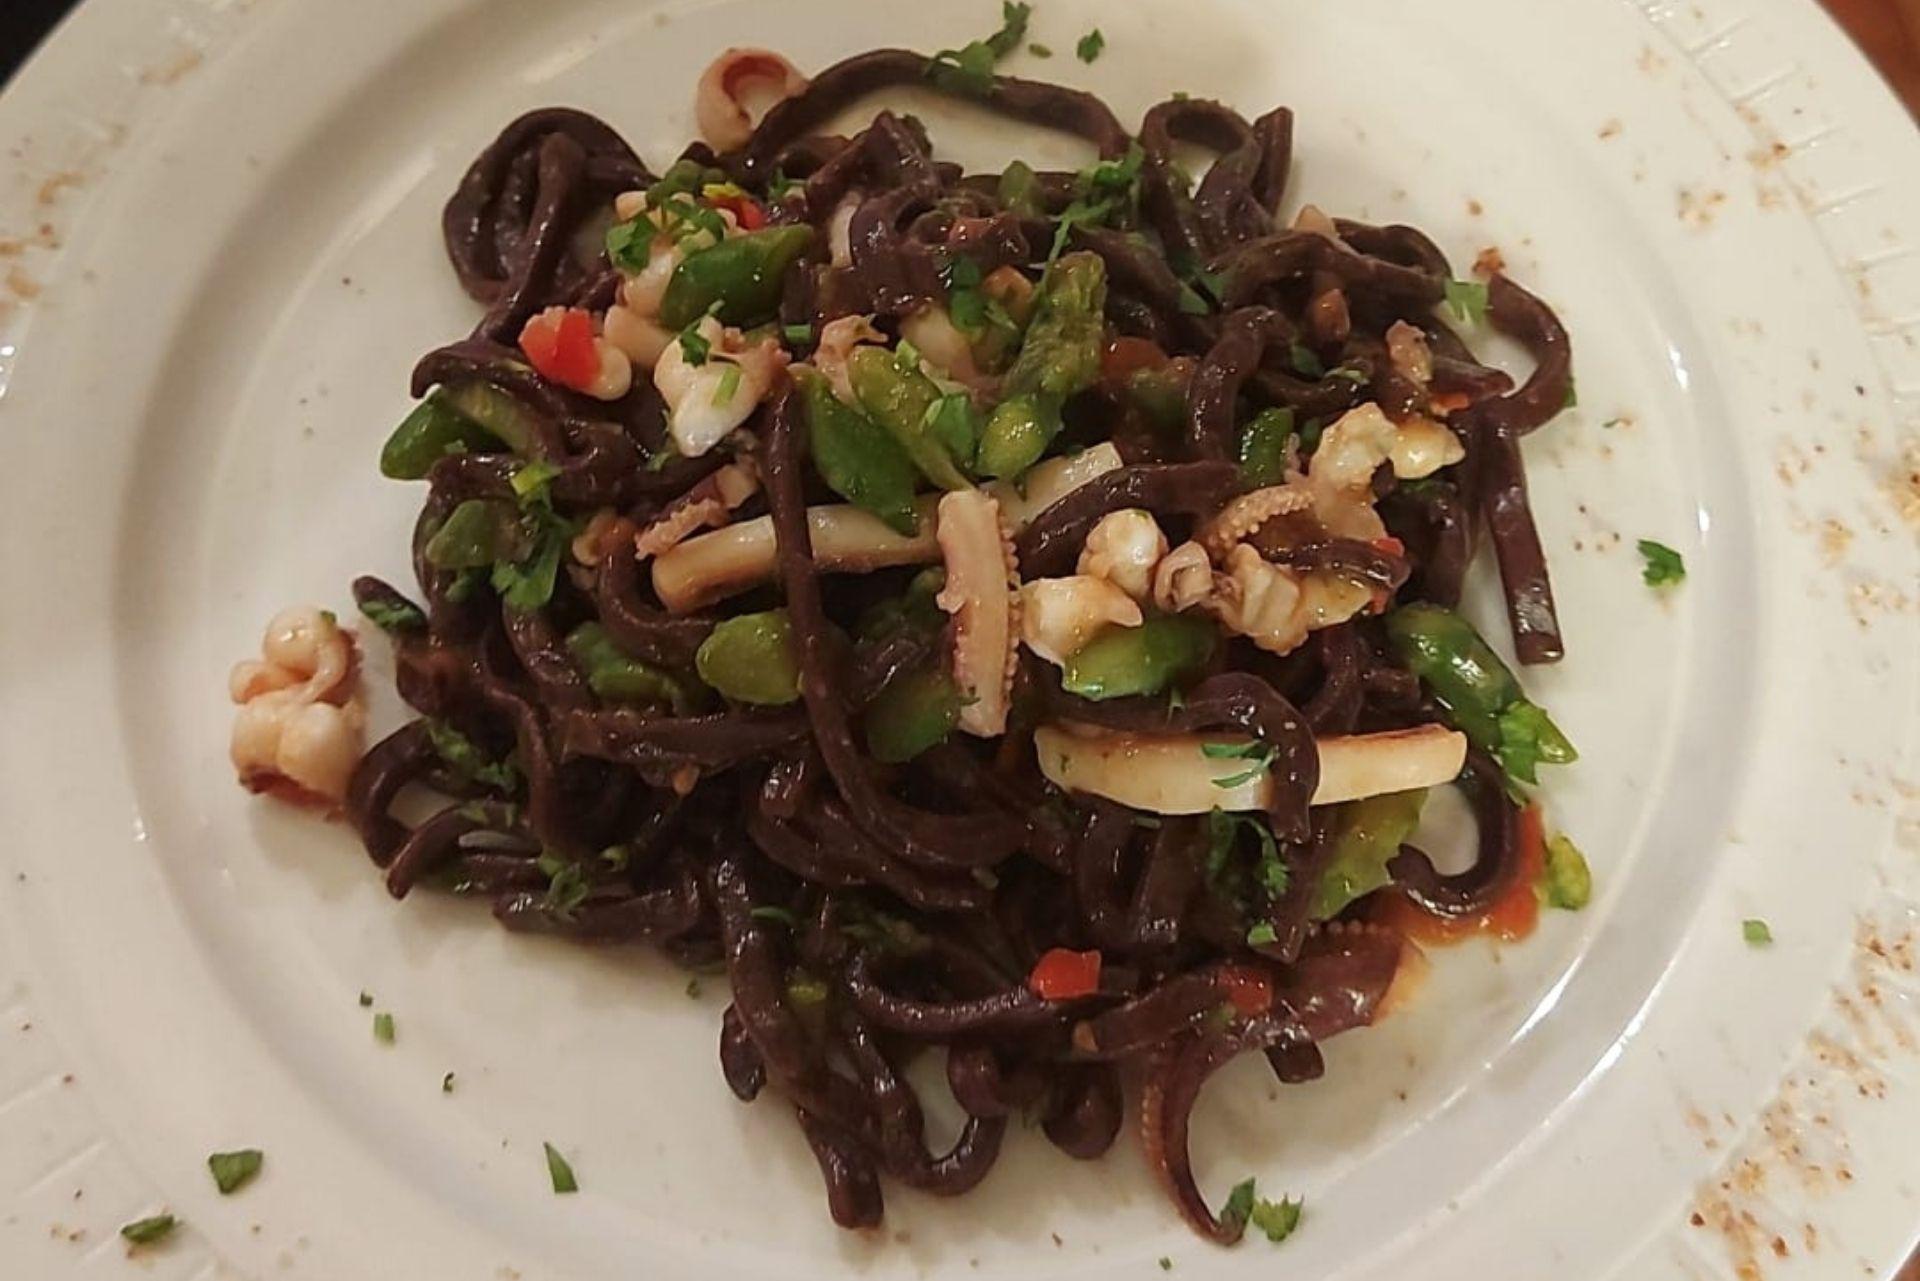 Scialatelli freschi al cacao, con calamari e asparagi verdi